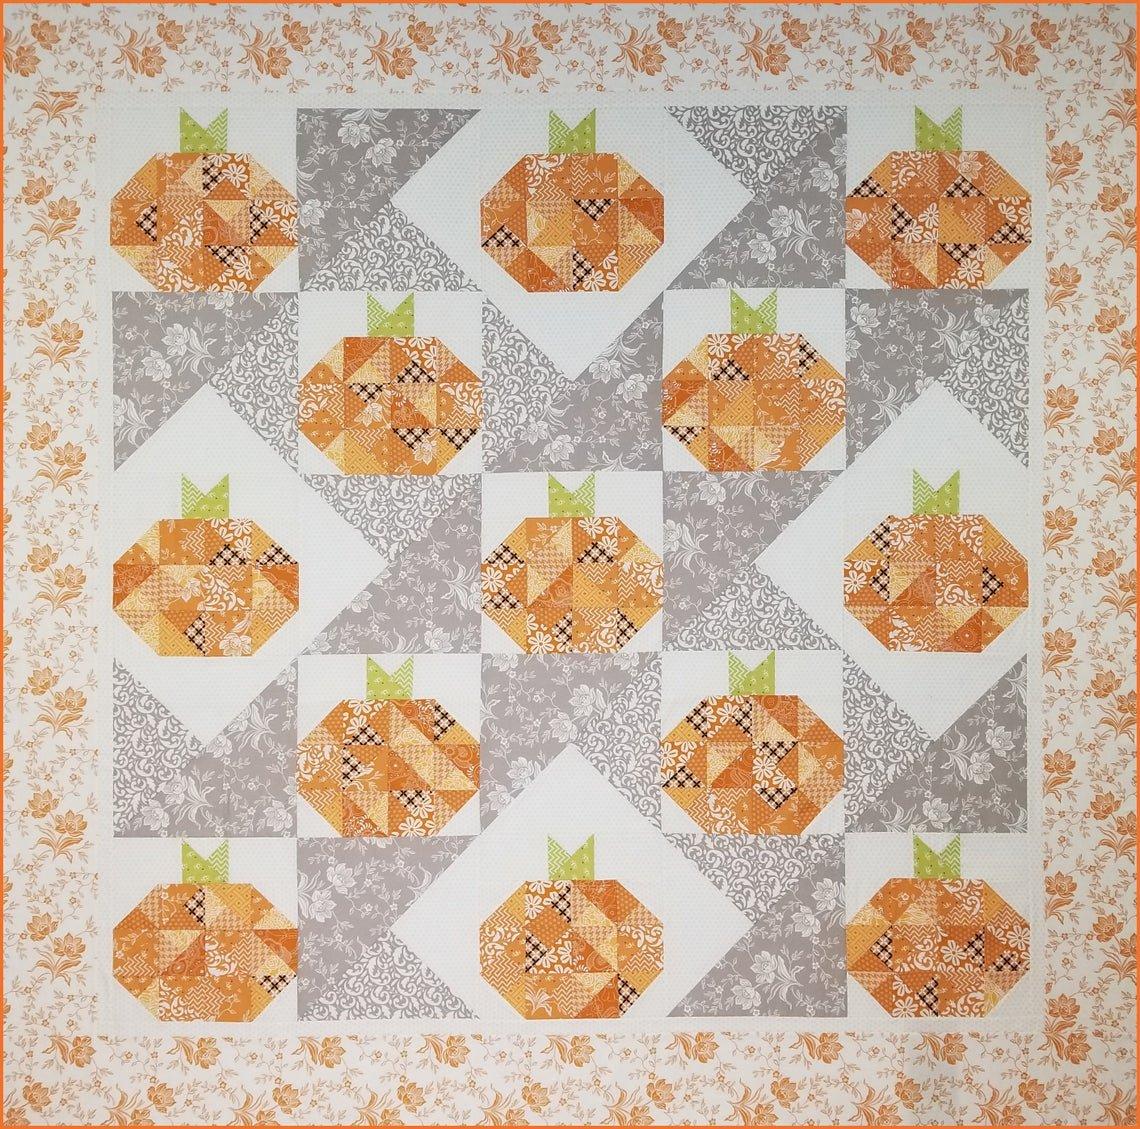 Turning Up Pumpkins Quilt Pattern - Michelle Hiatt - STASHBuster Series